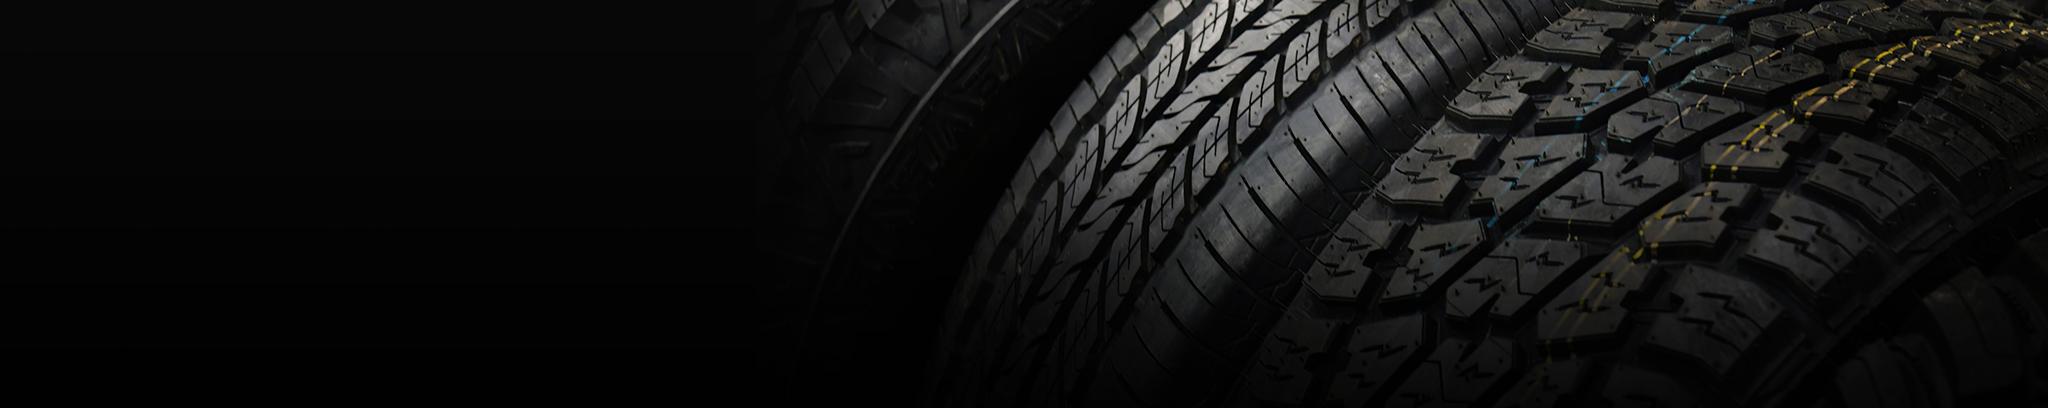 New Tires & Alignment